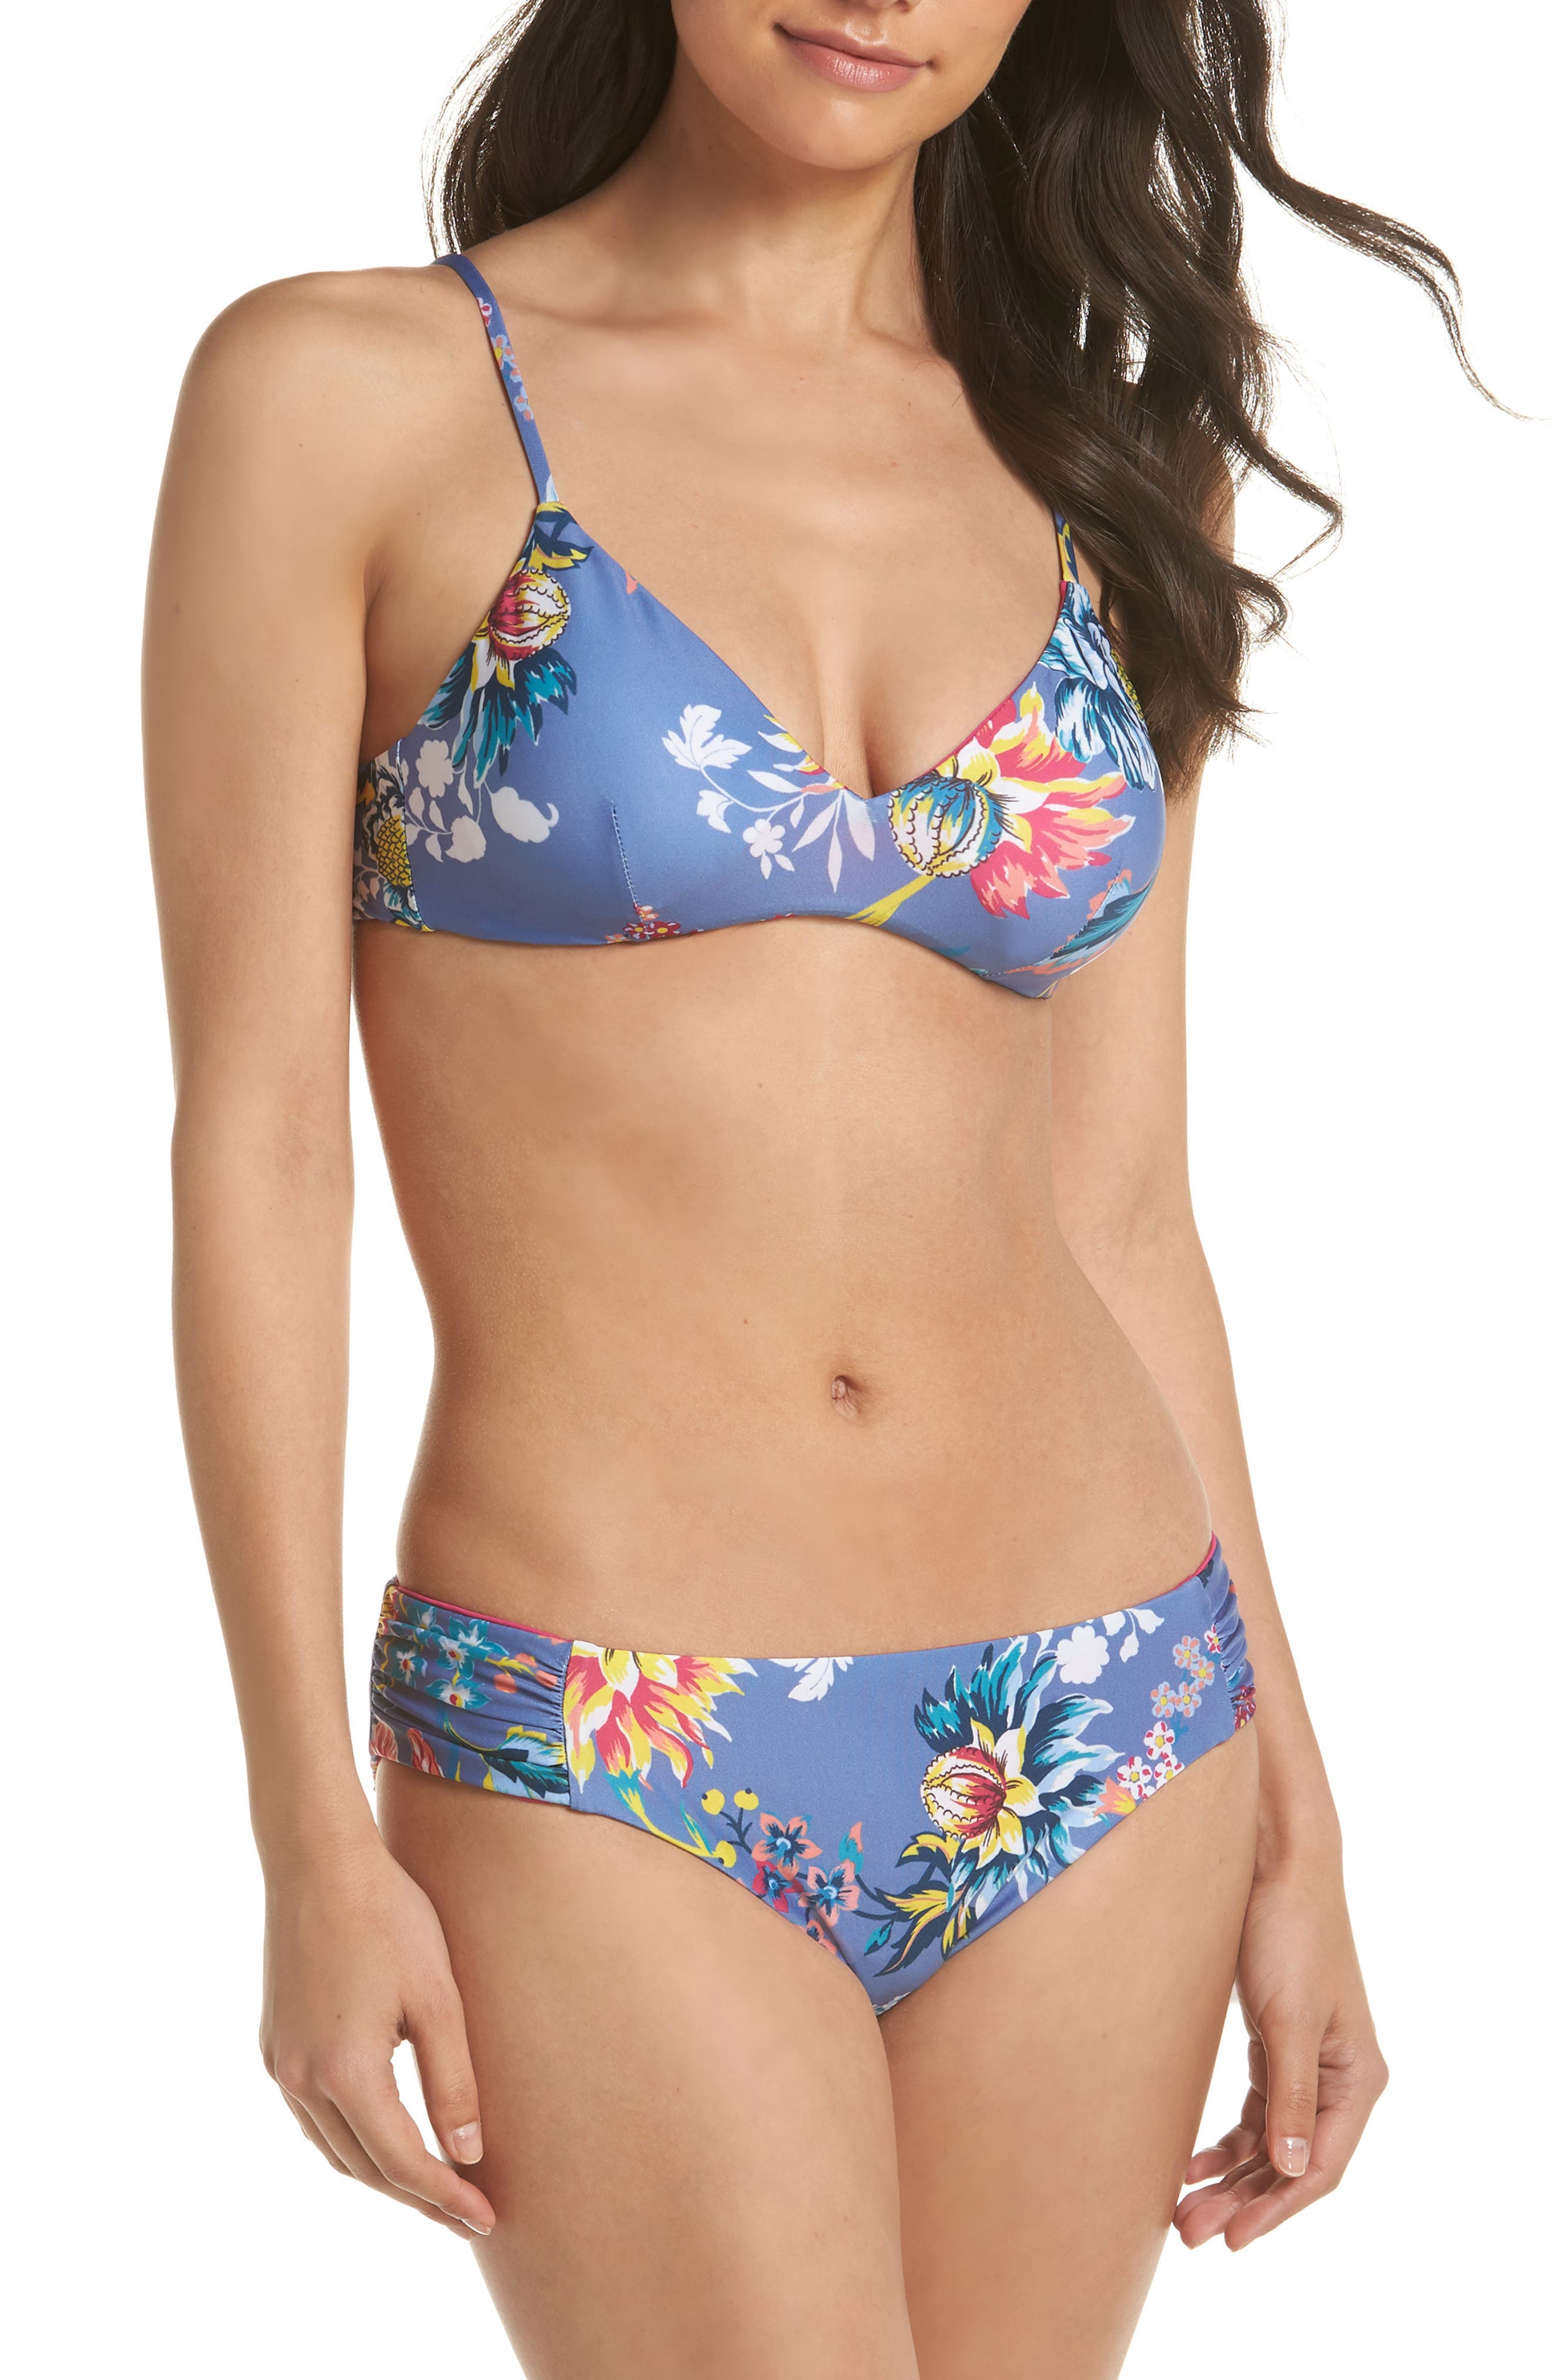 Victoria Garden Reversible Bikini Bottoms,                             Alternate thumbnail 7, color,                             PURPLE/ BLUE MULTI